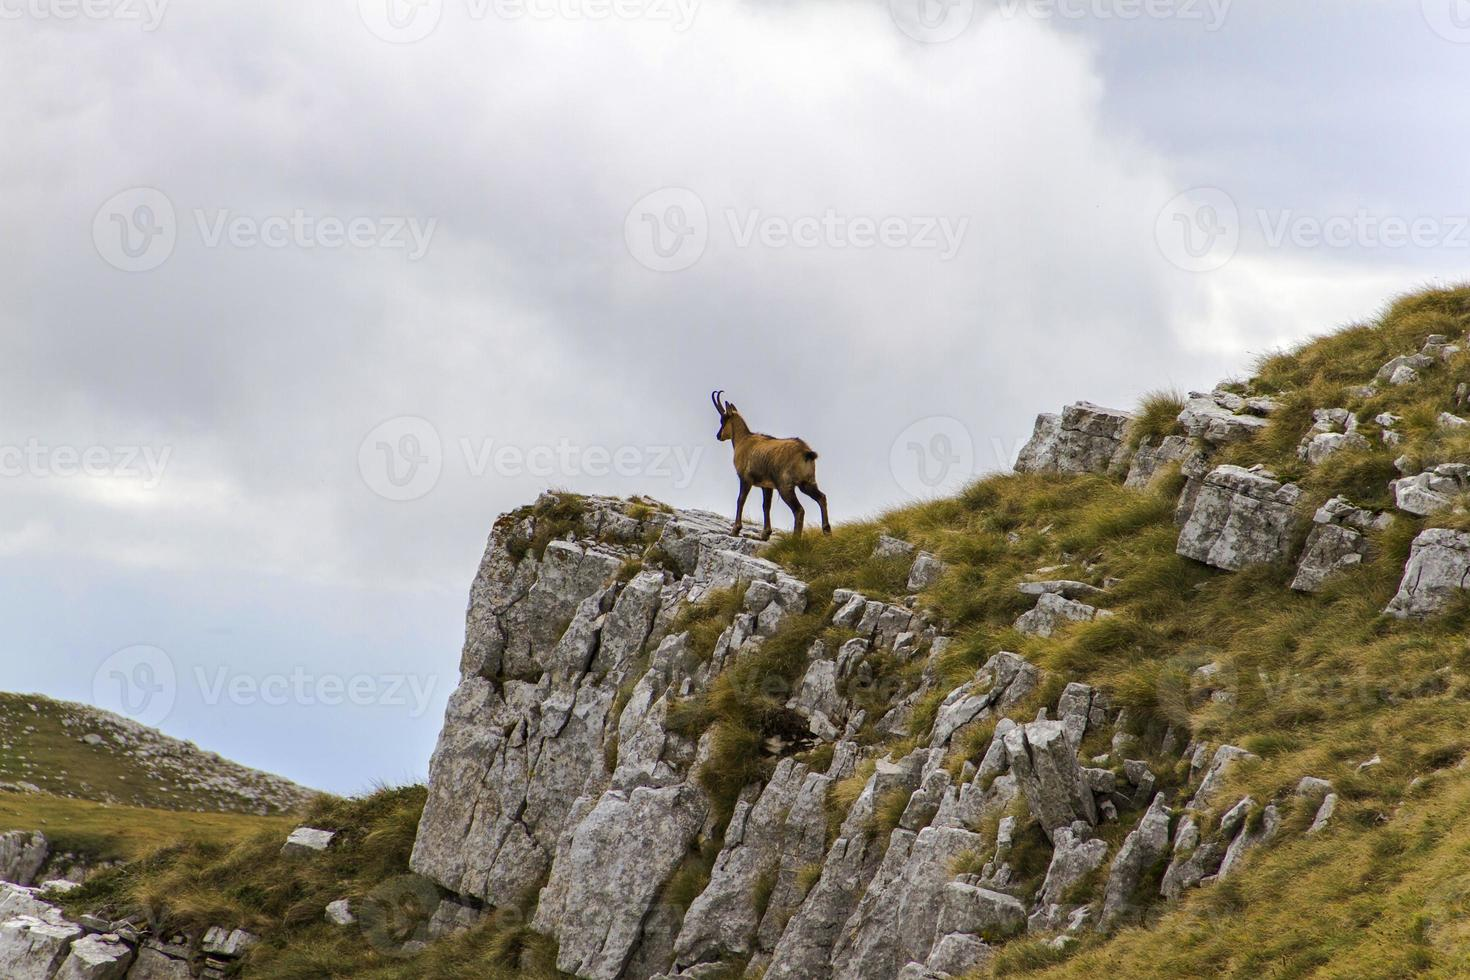 gamuza en la cima de una roca foto